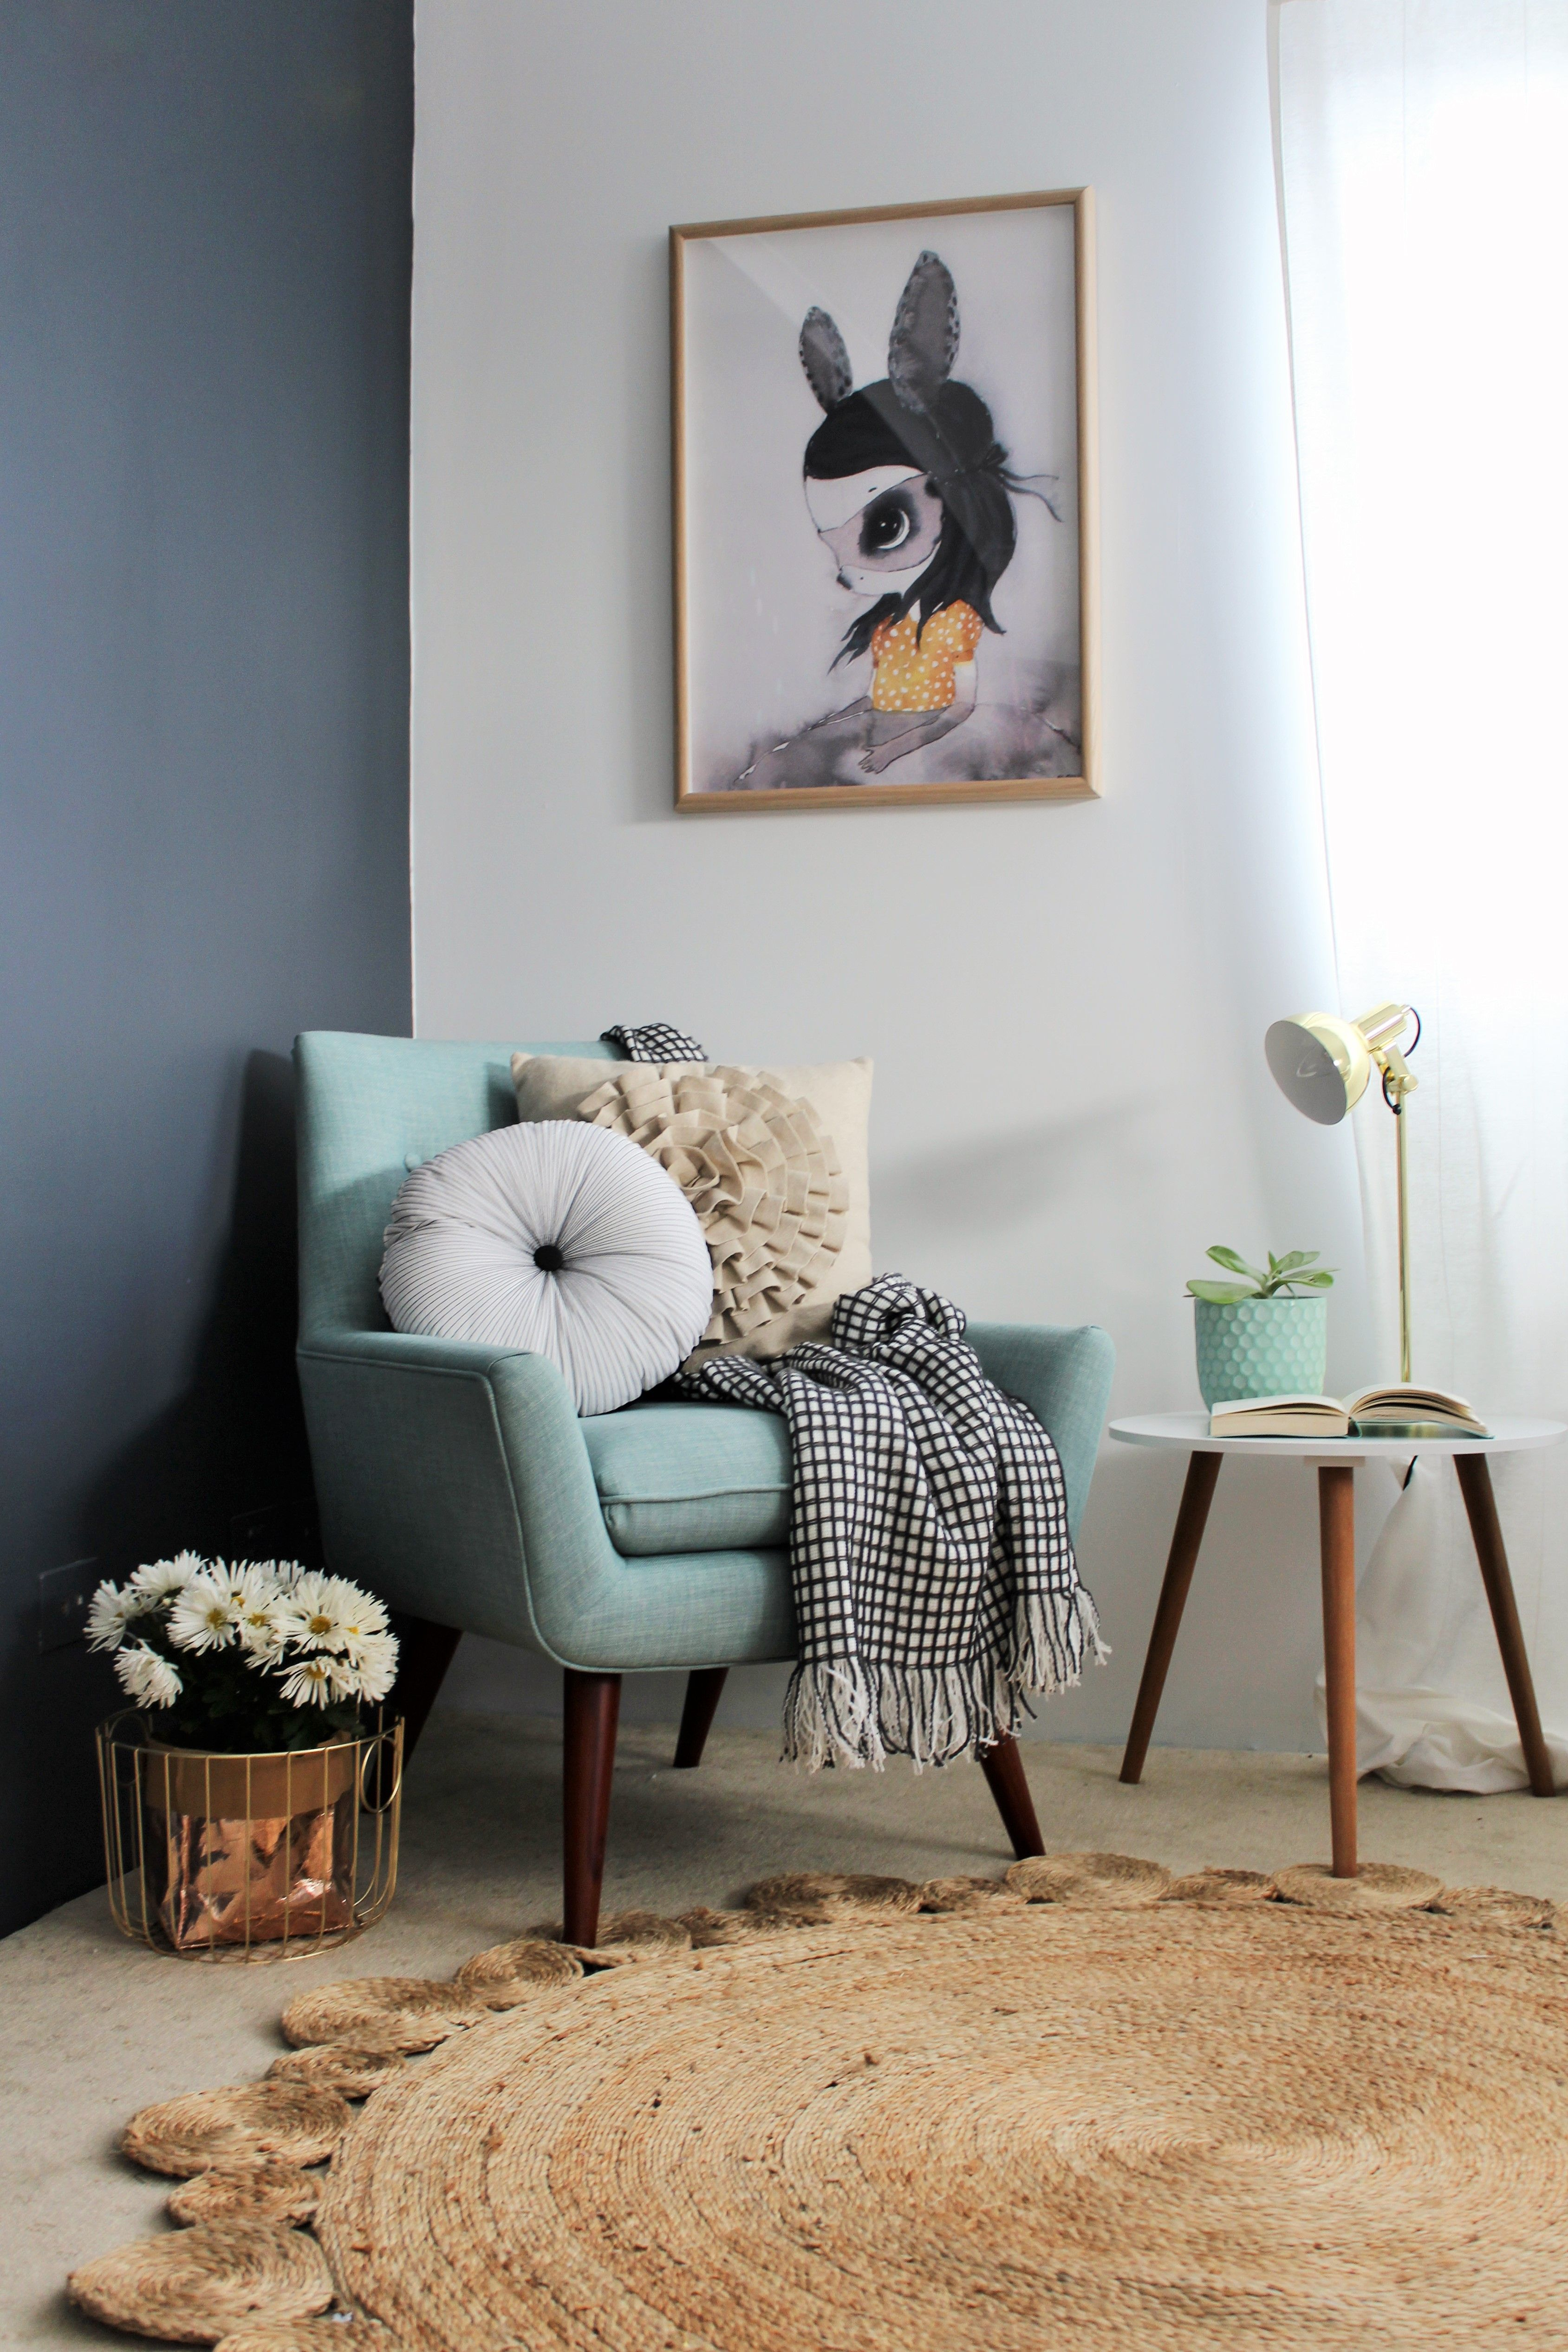 Home Design Ideas Australia: Amazing Interior Decor Finds From Target